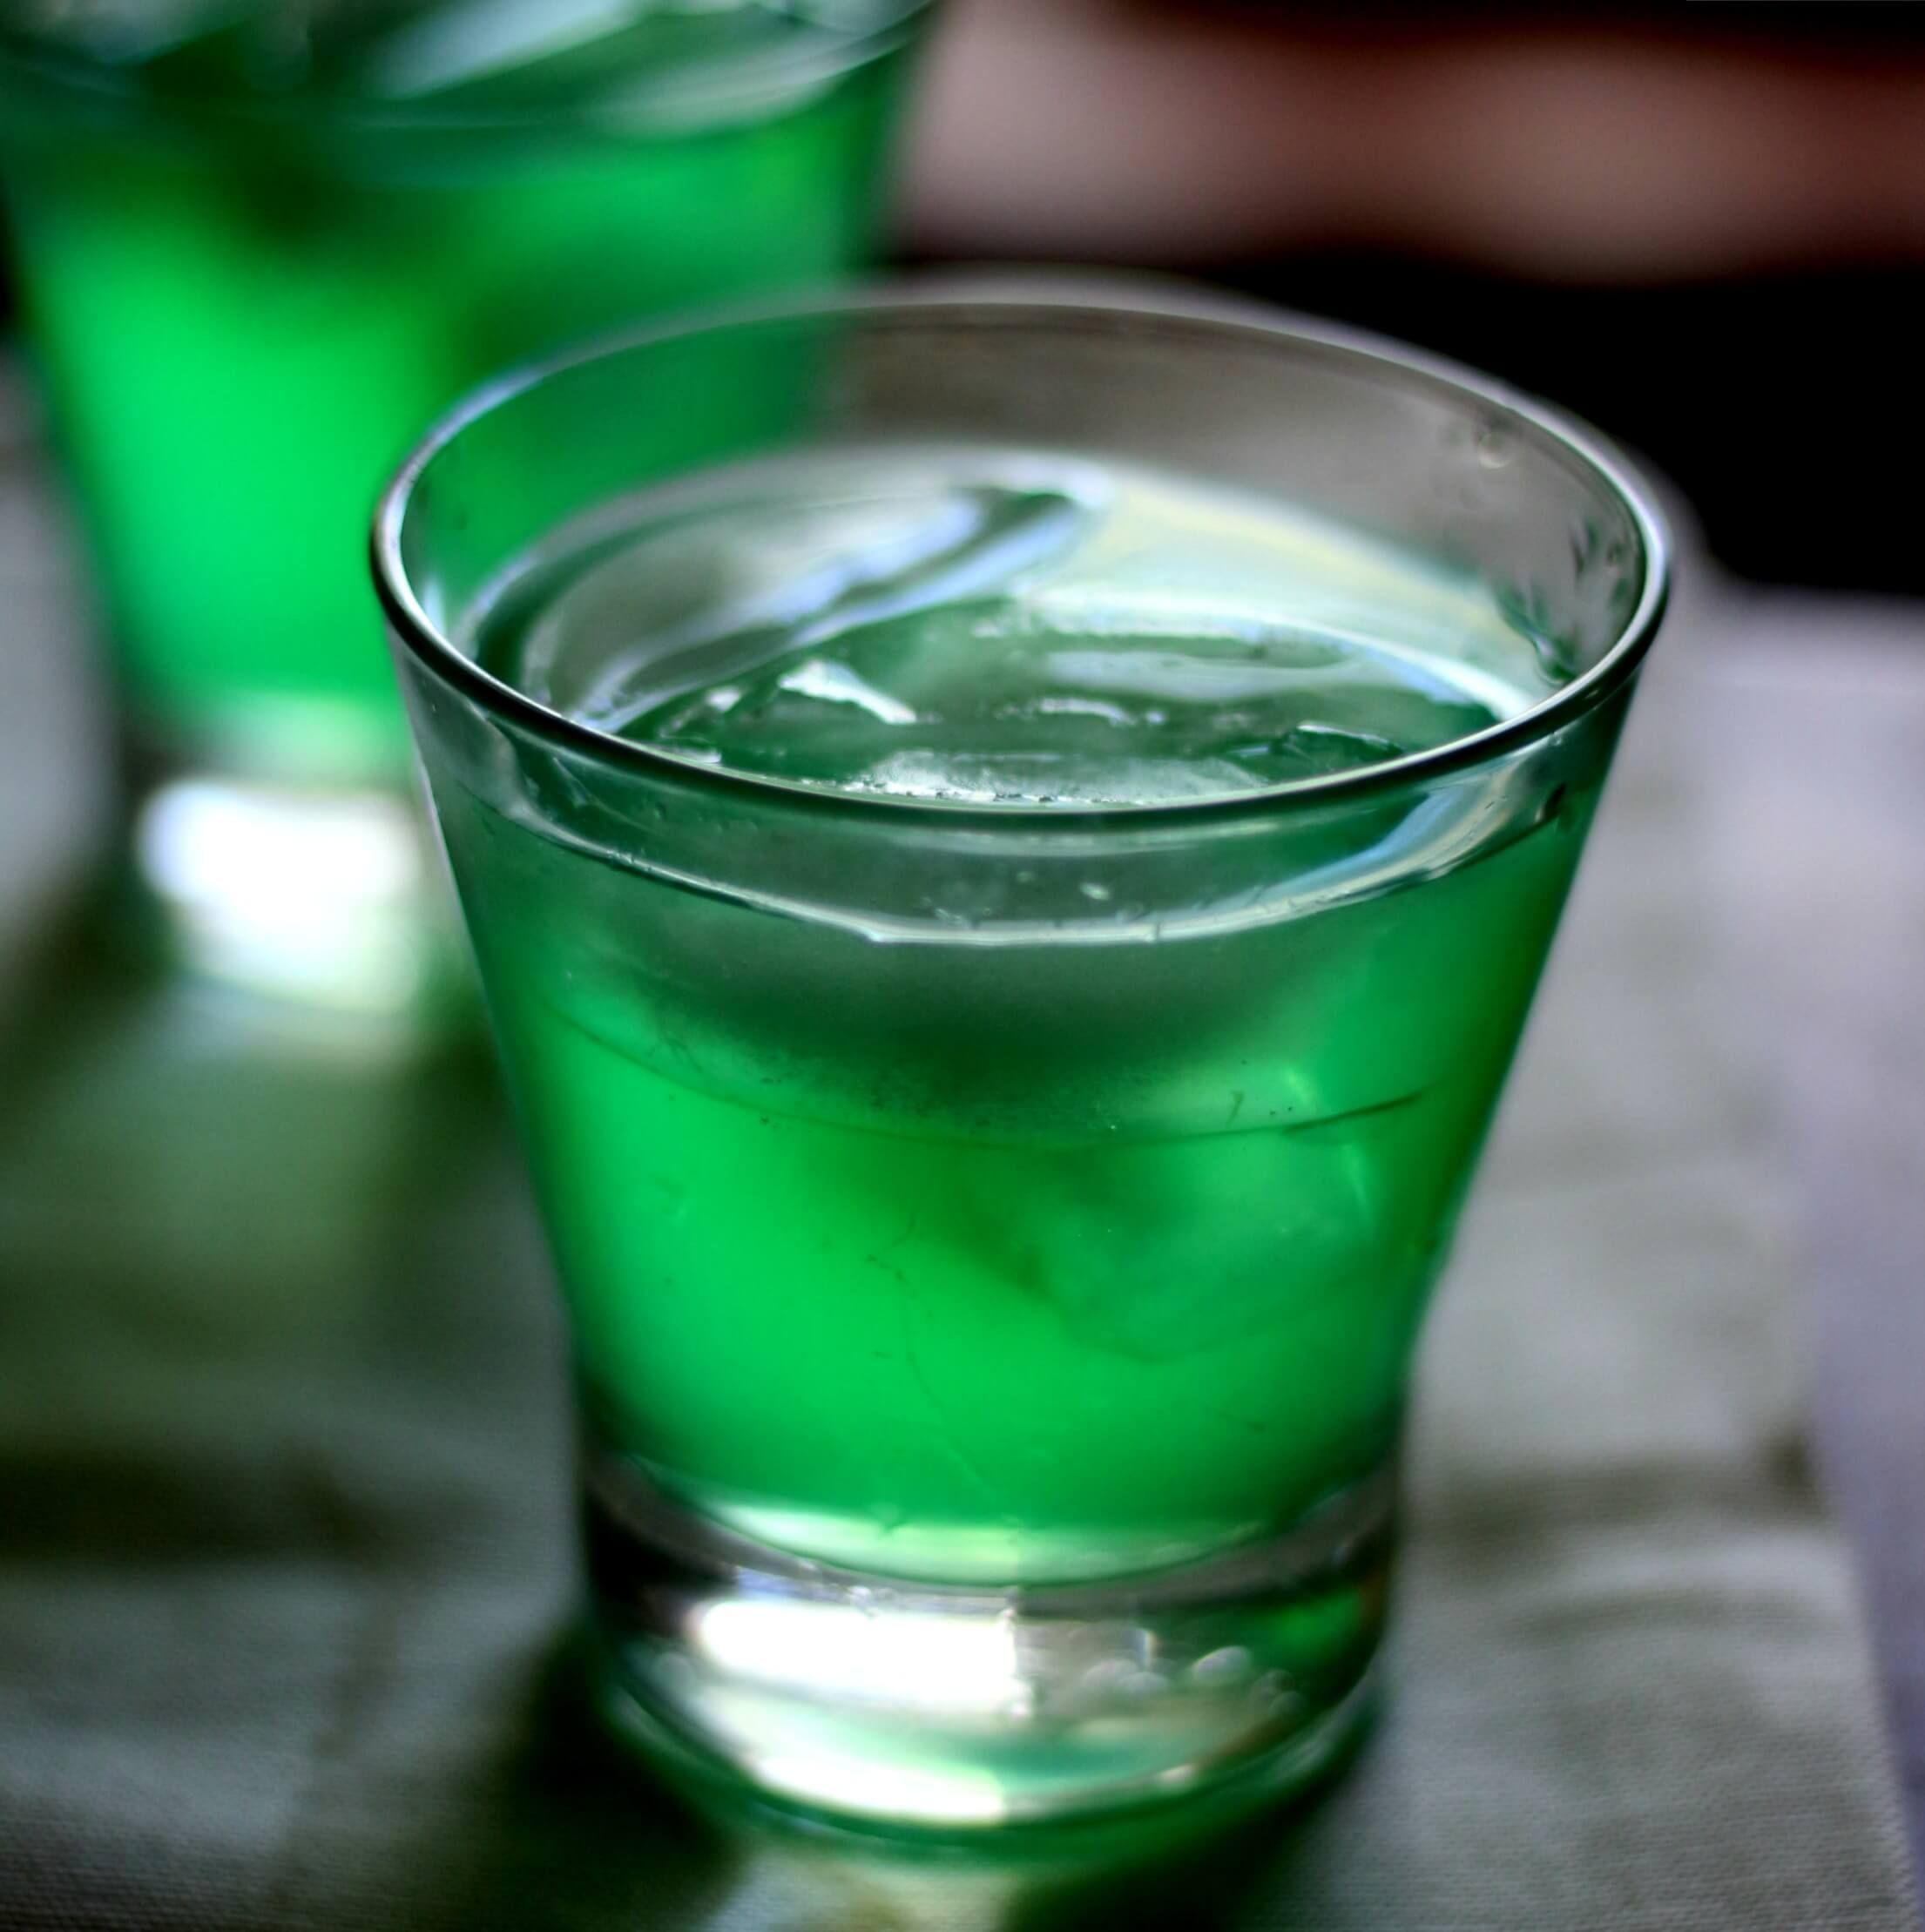 Pics Of Drink